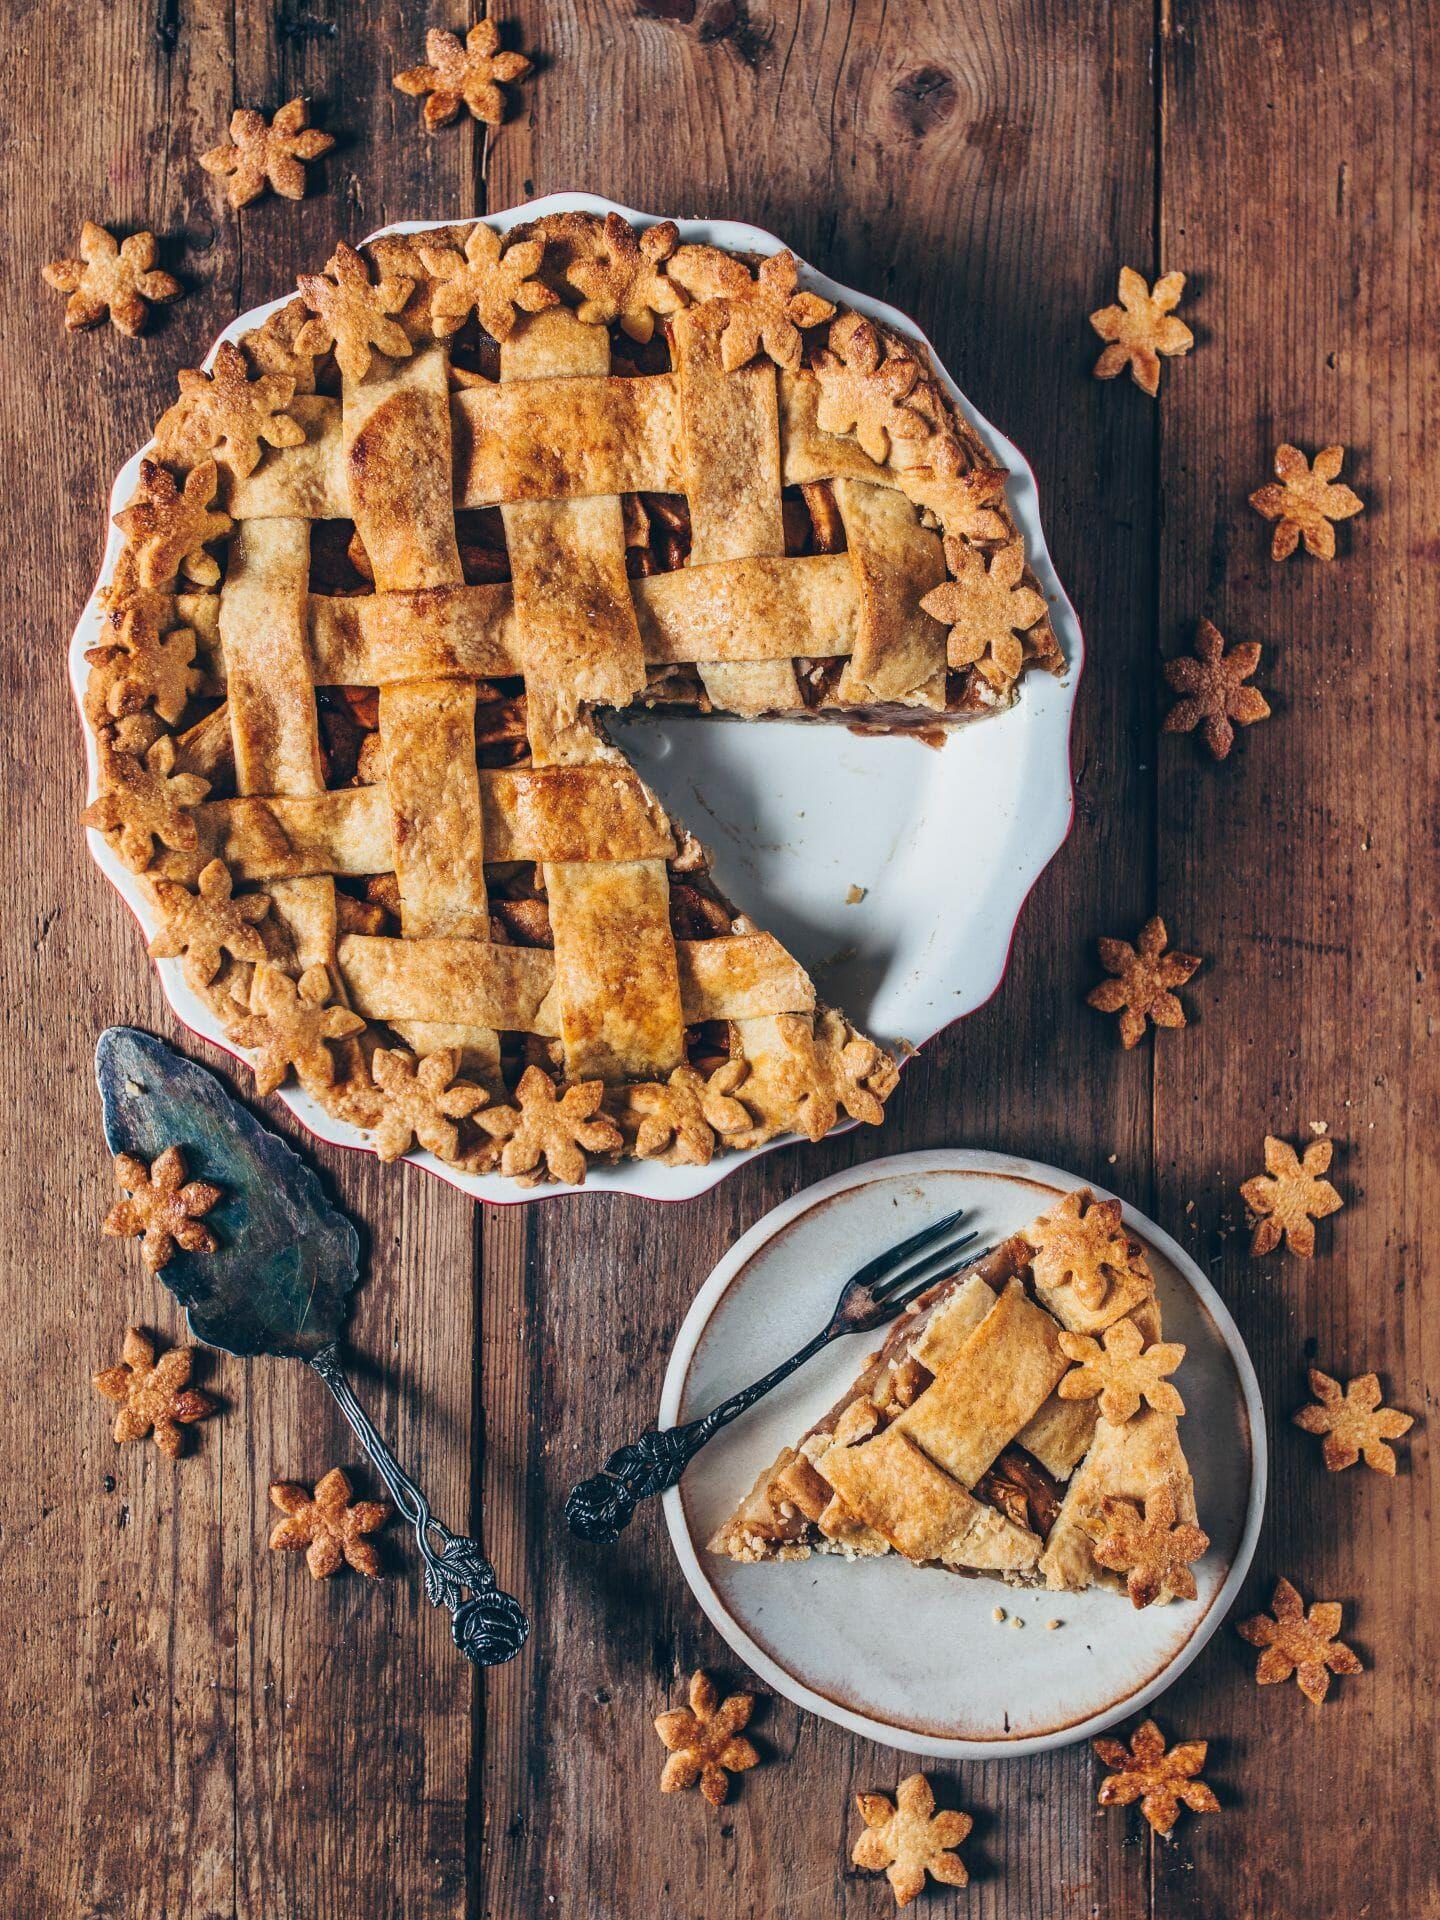 Vegan Apple Pie Easy Recipe Bianca Zapatka Recipes Recipe Vegan Apple Pie Gluten Free Apple Recipes Apple Pie